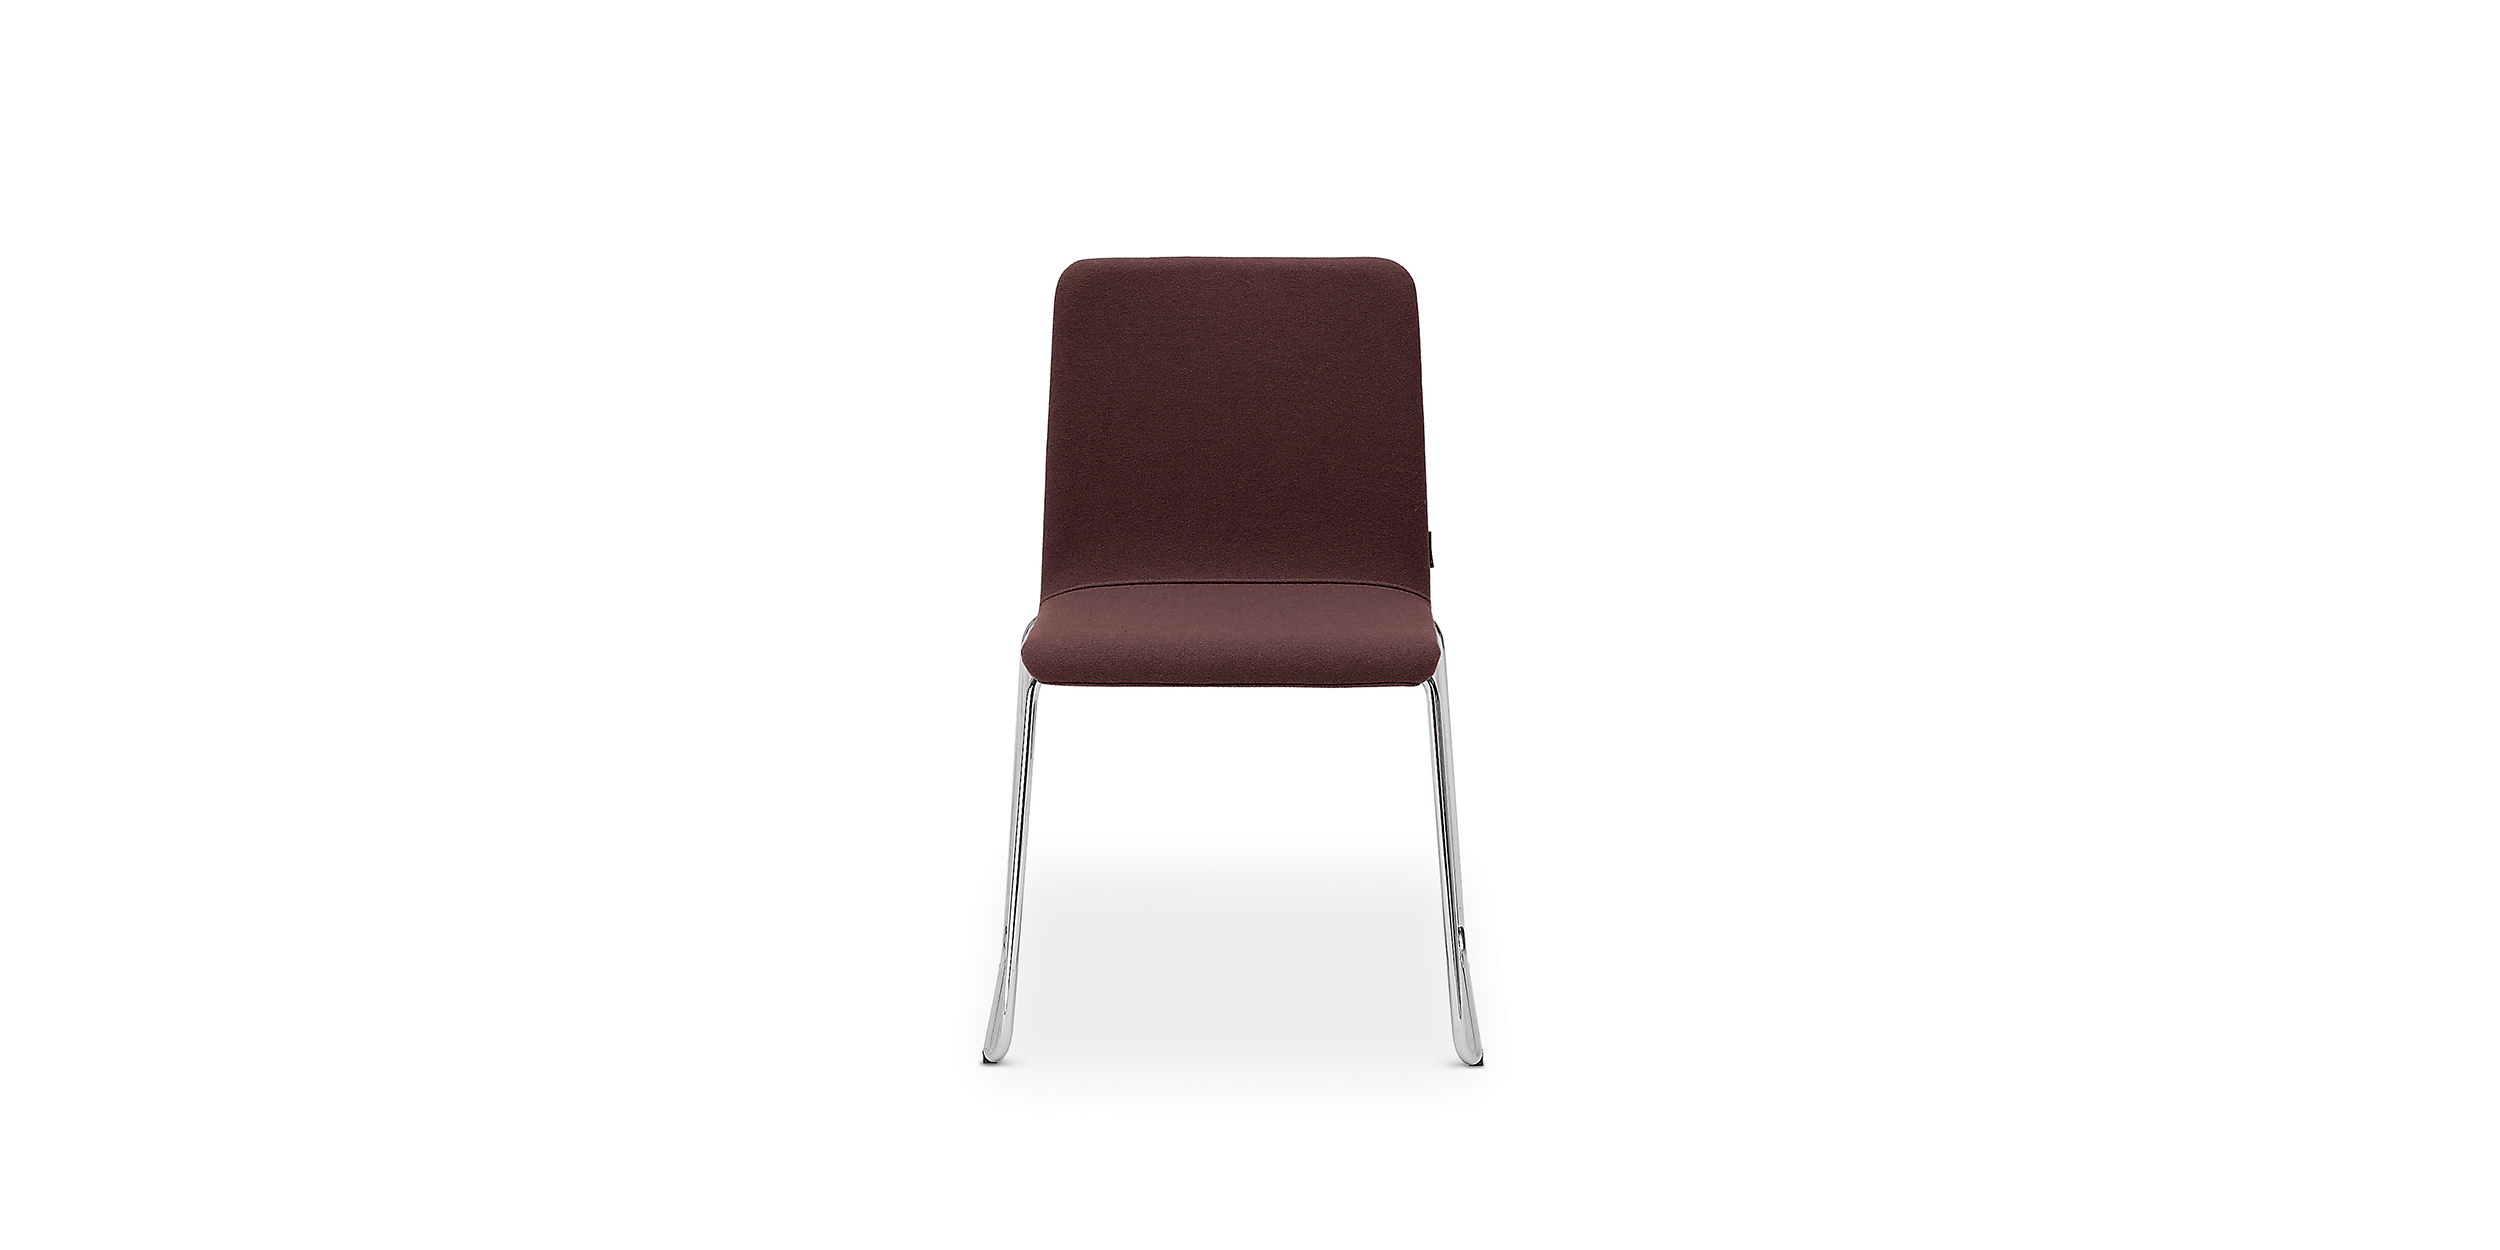 Mono Light, Stapelbar stol by Claesson Koivisto Rune